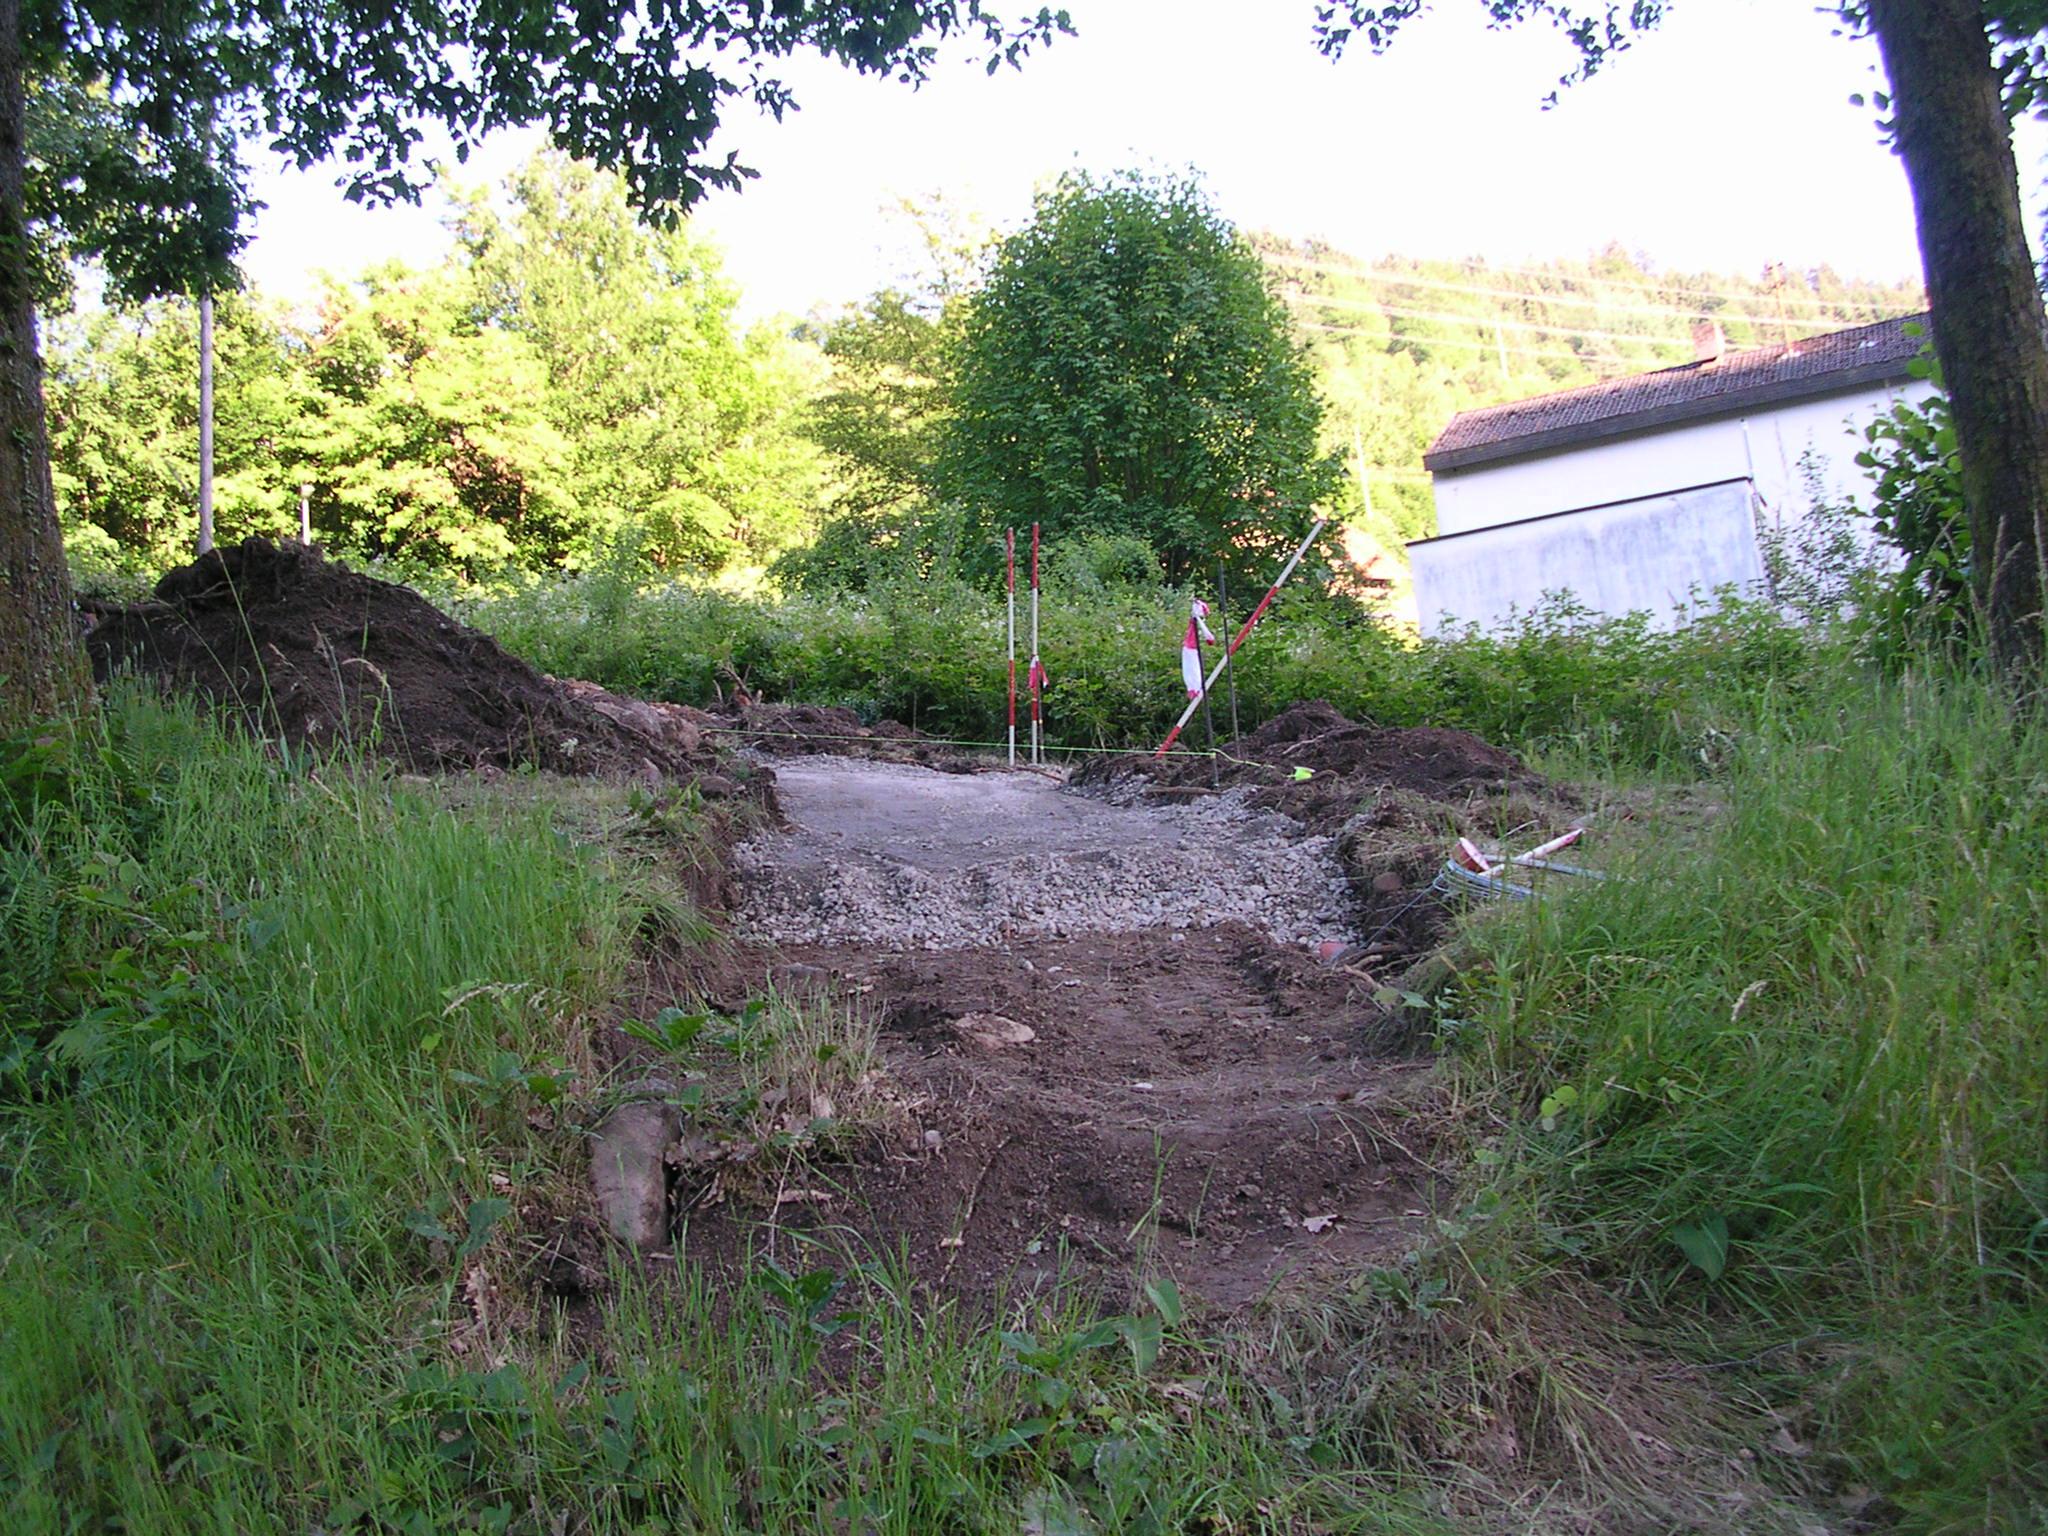 Neuer Zugangsweg zum Sportplatz Langenbrand (01)